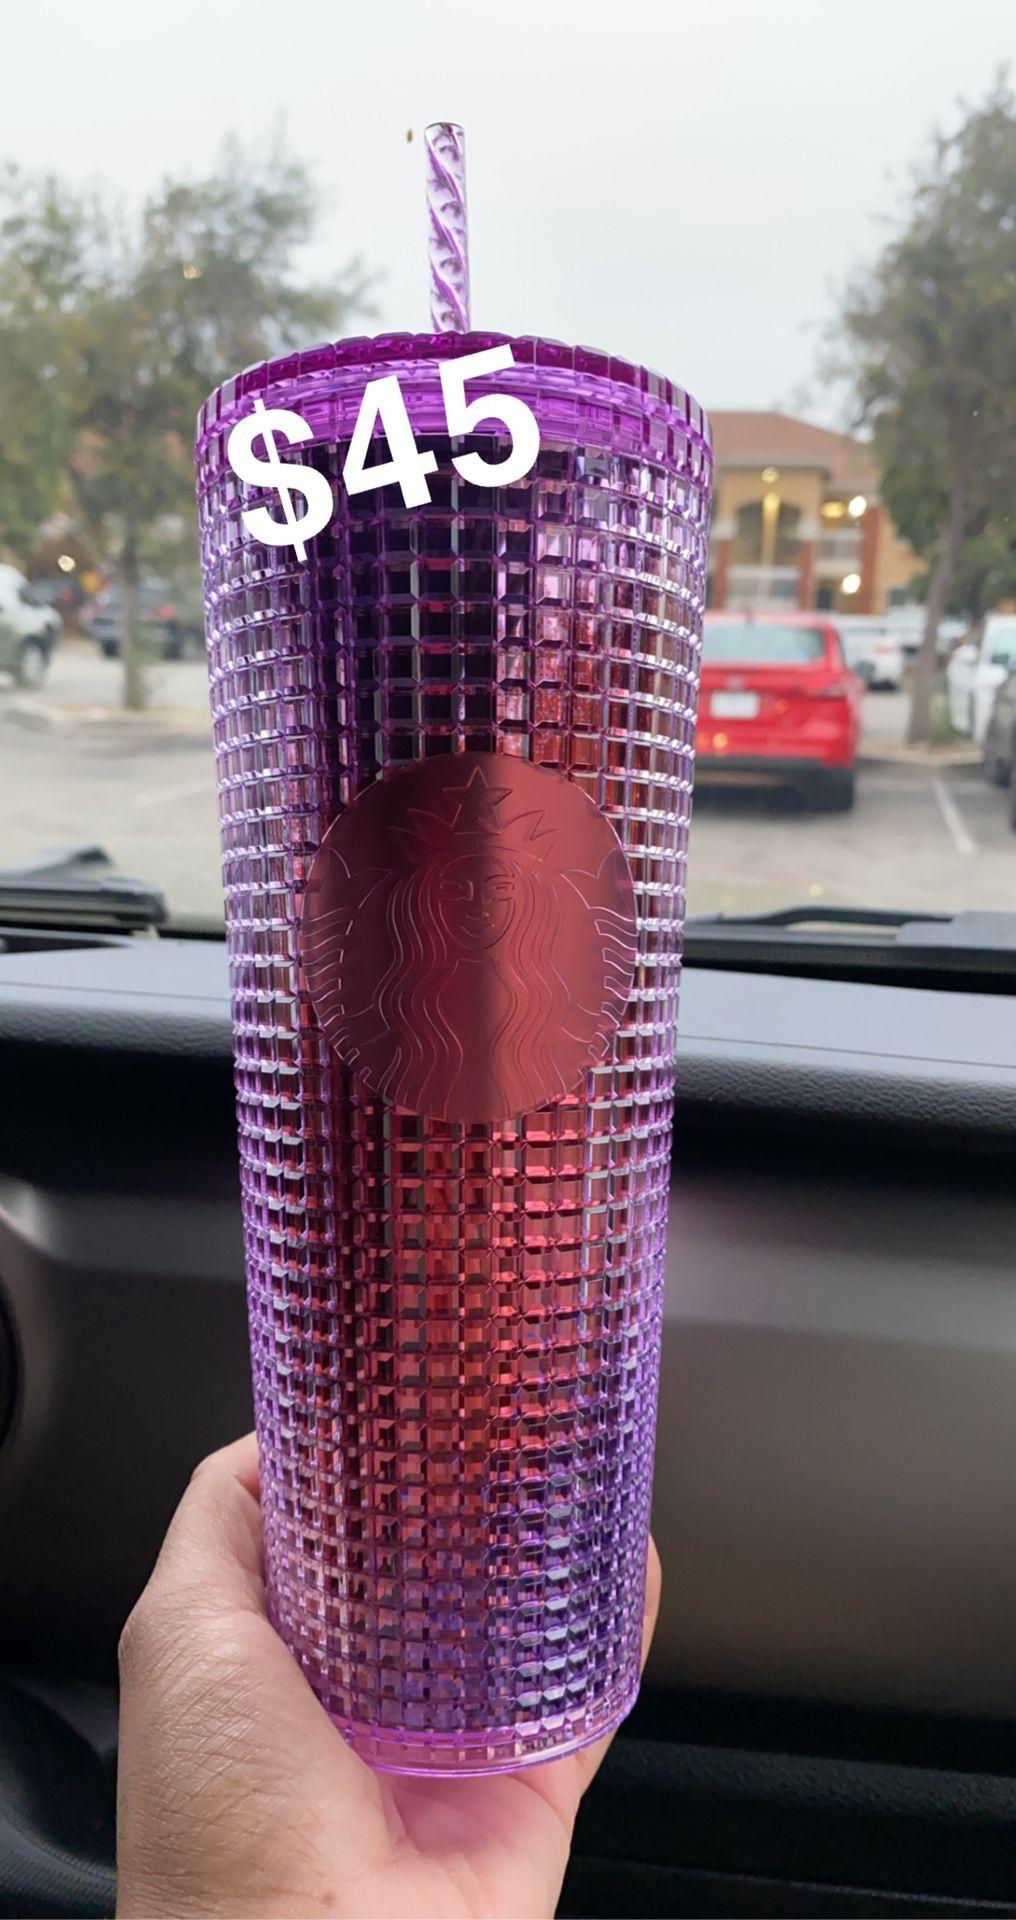 New Starbucks Cup